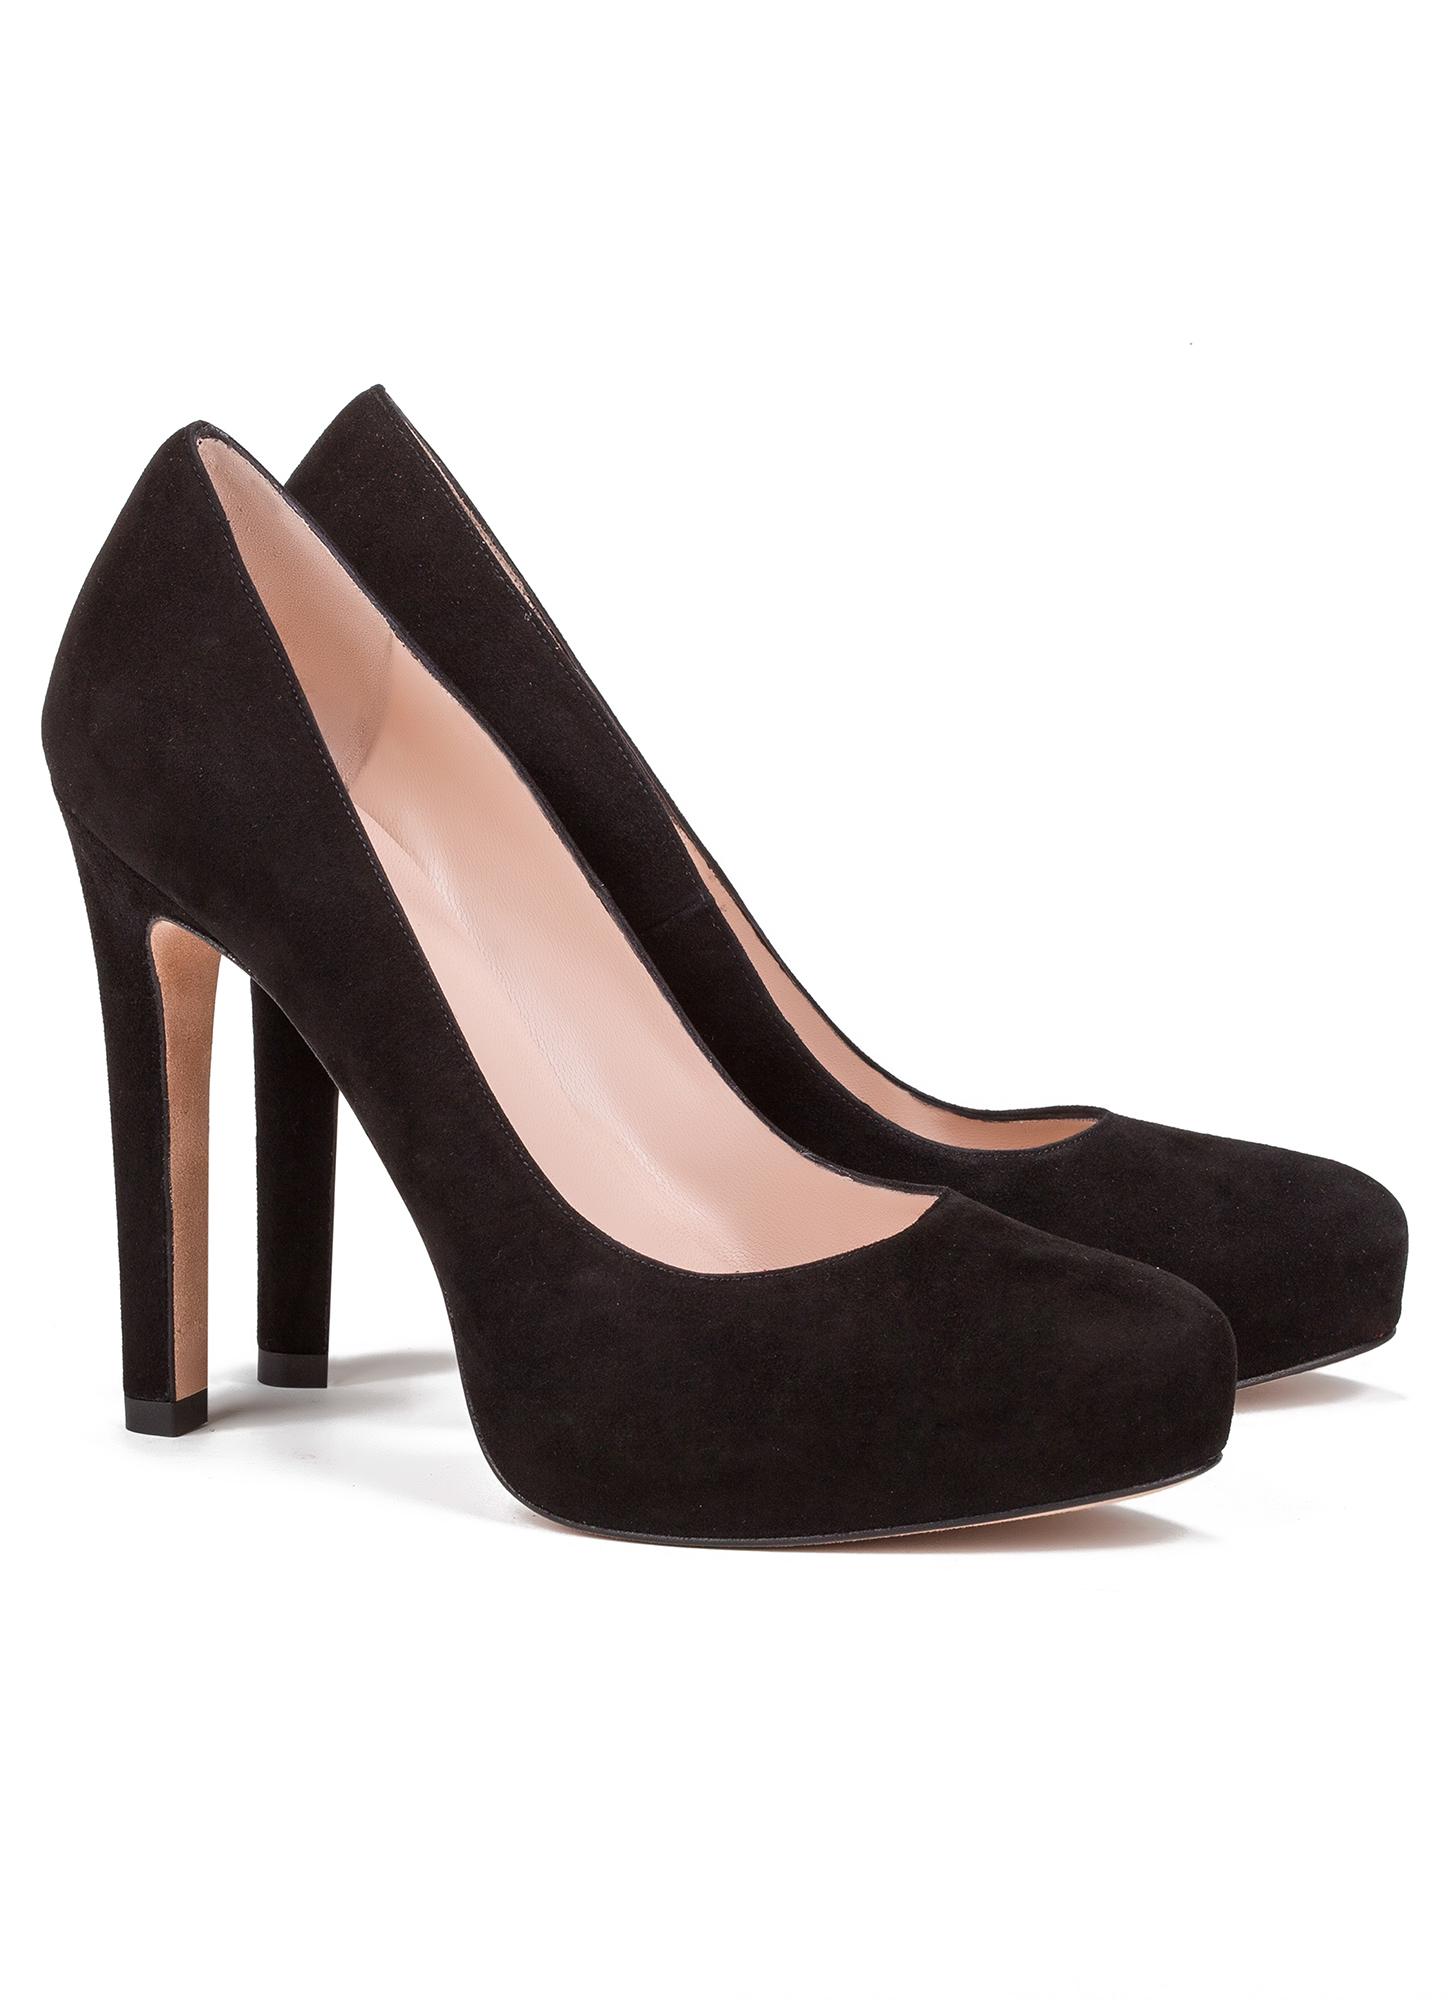 Planifique Sus Zapatos Salon Plataforma Stock De Salon Ideas